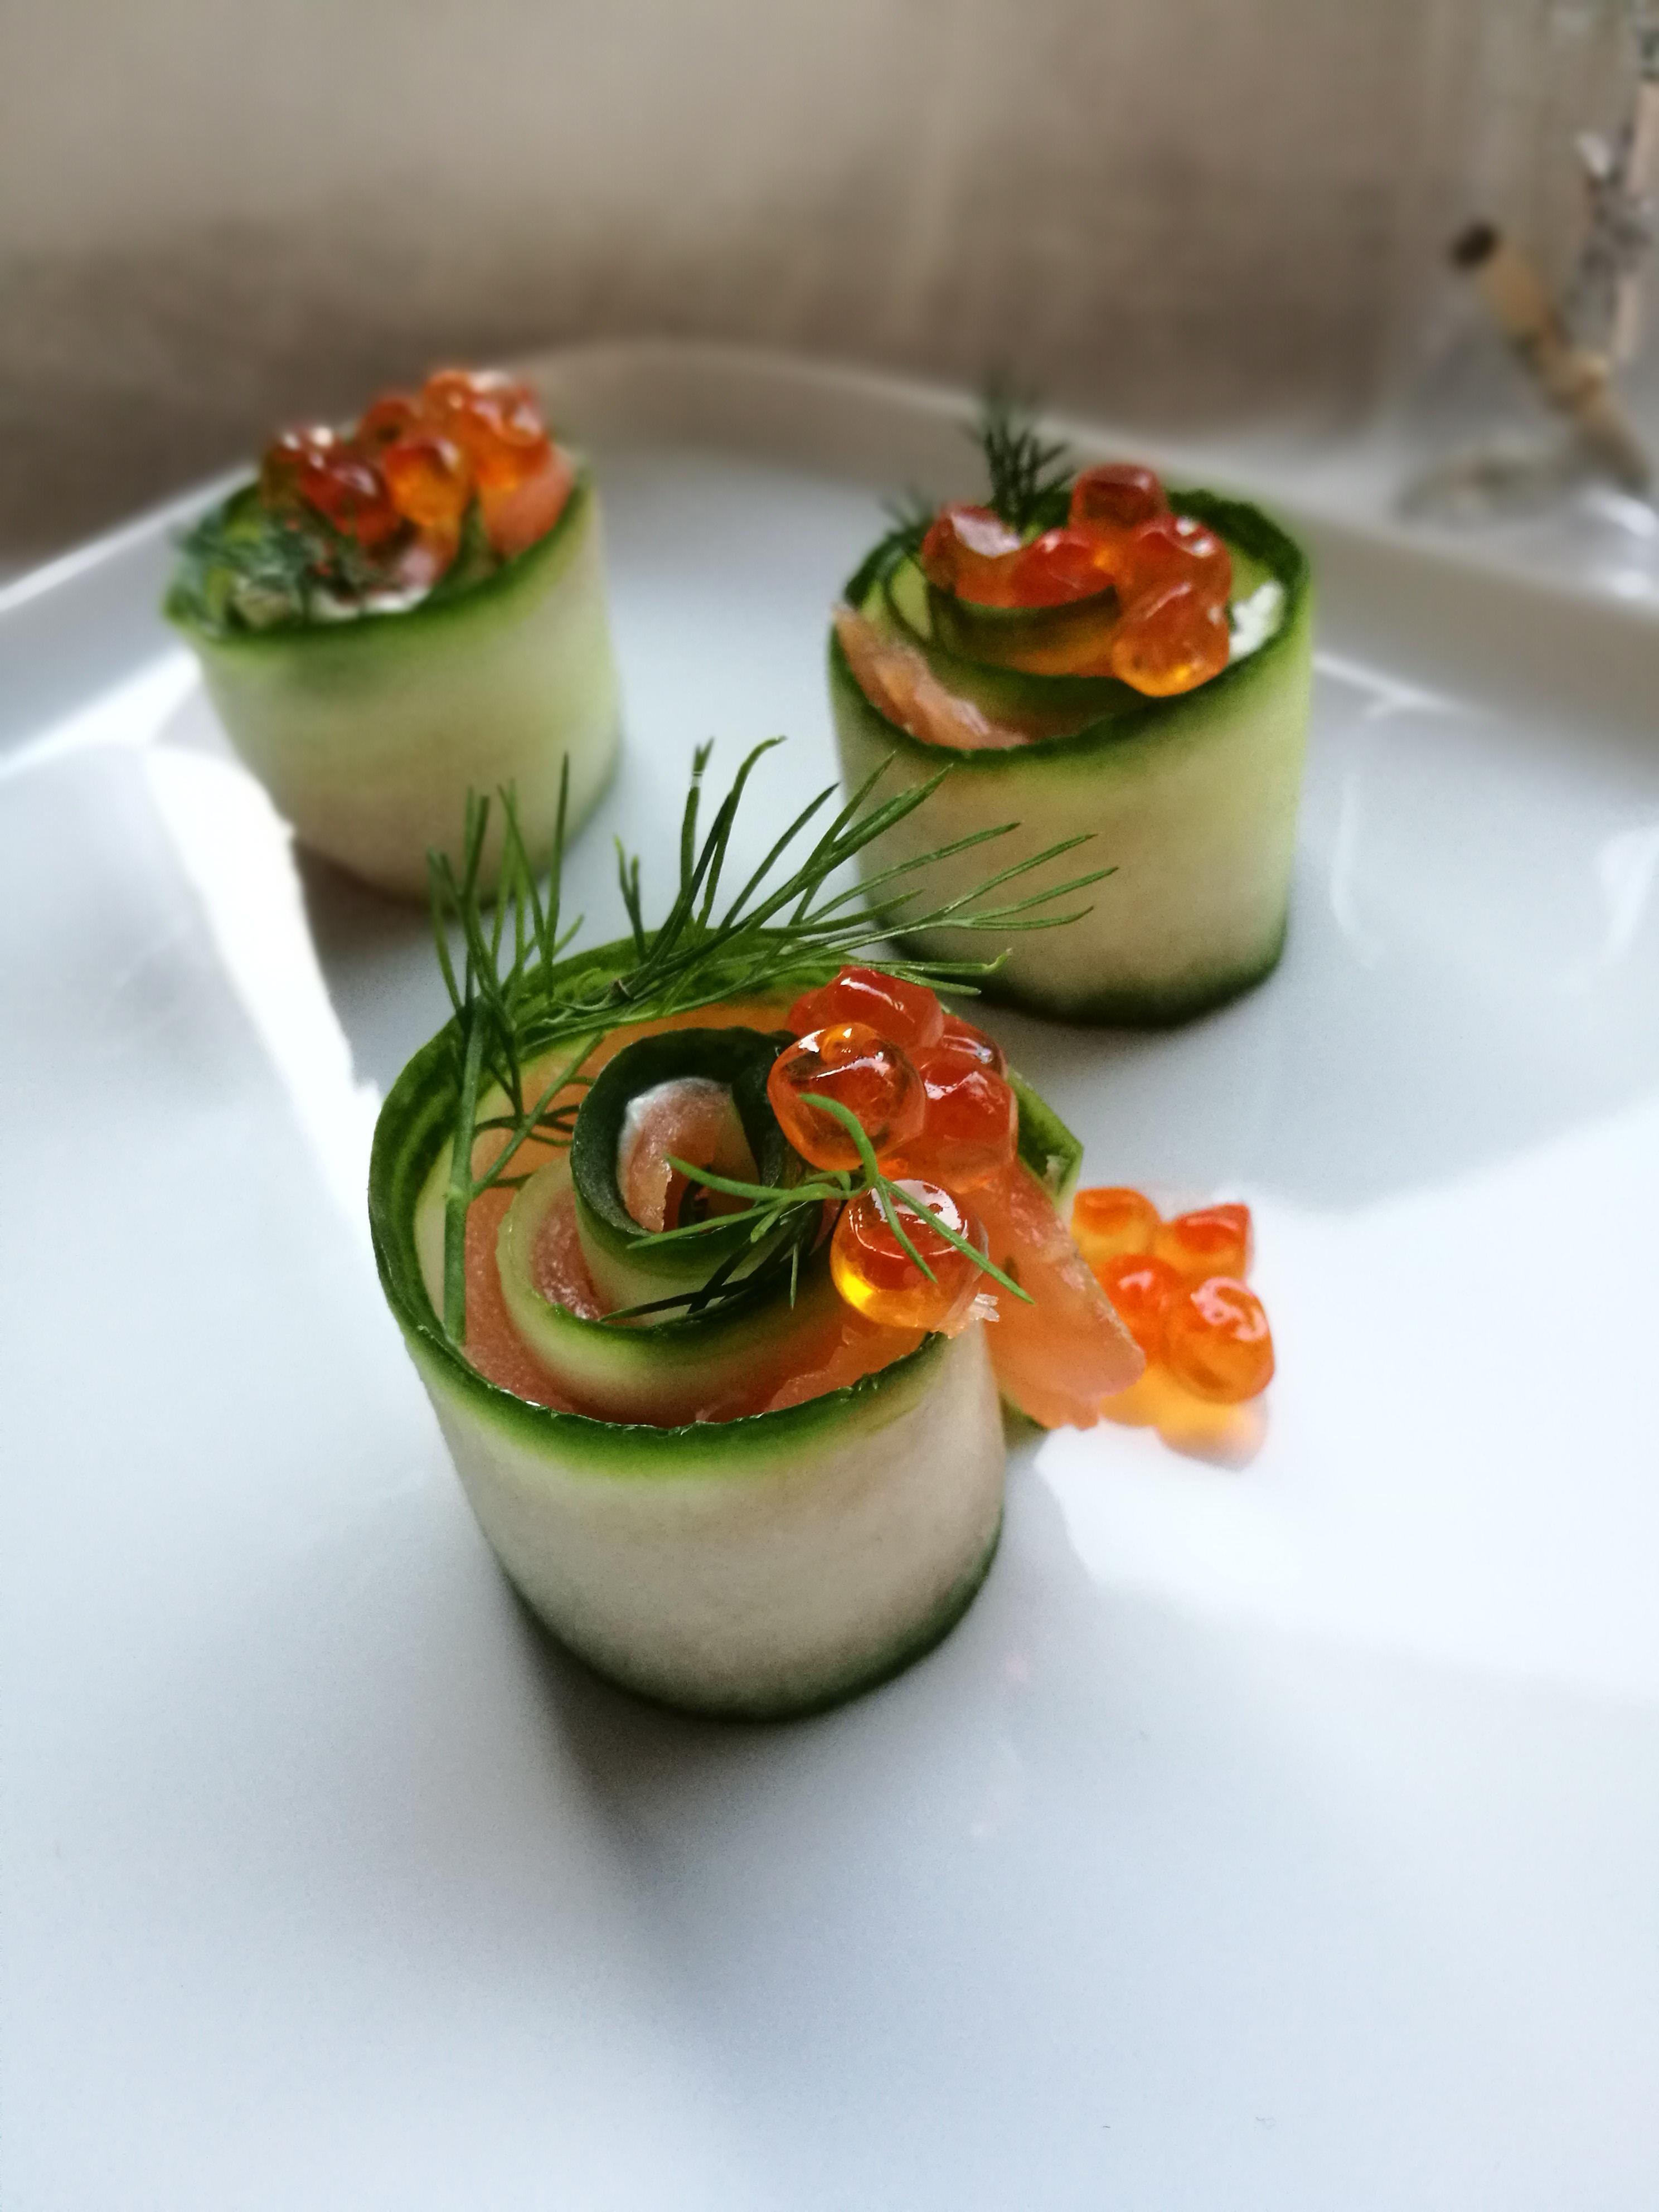 hapjes voor de feestdagen : zalm – avocado – gerookte forelfilet